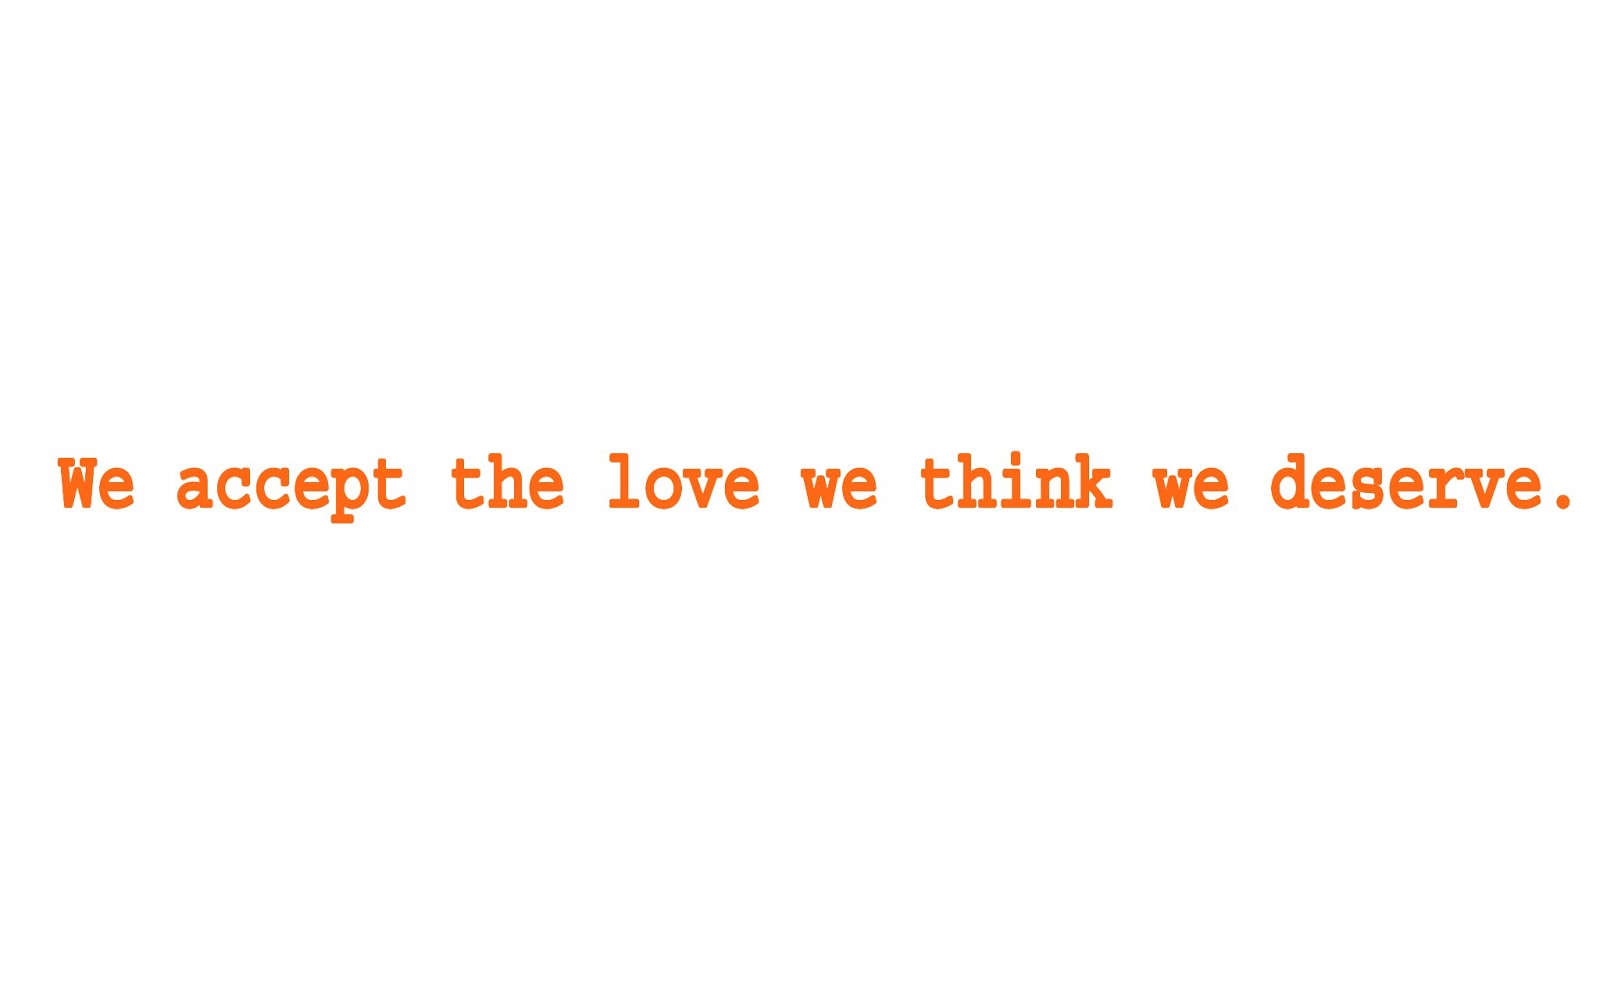 We Seek The Love We Think We Deserve